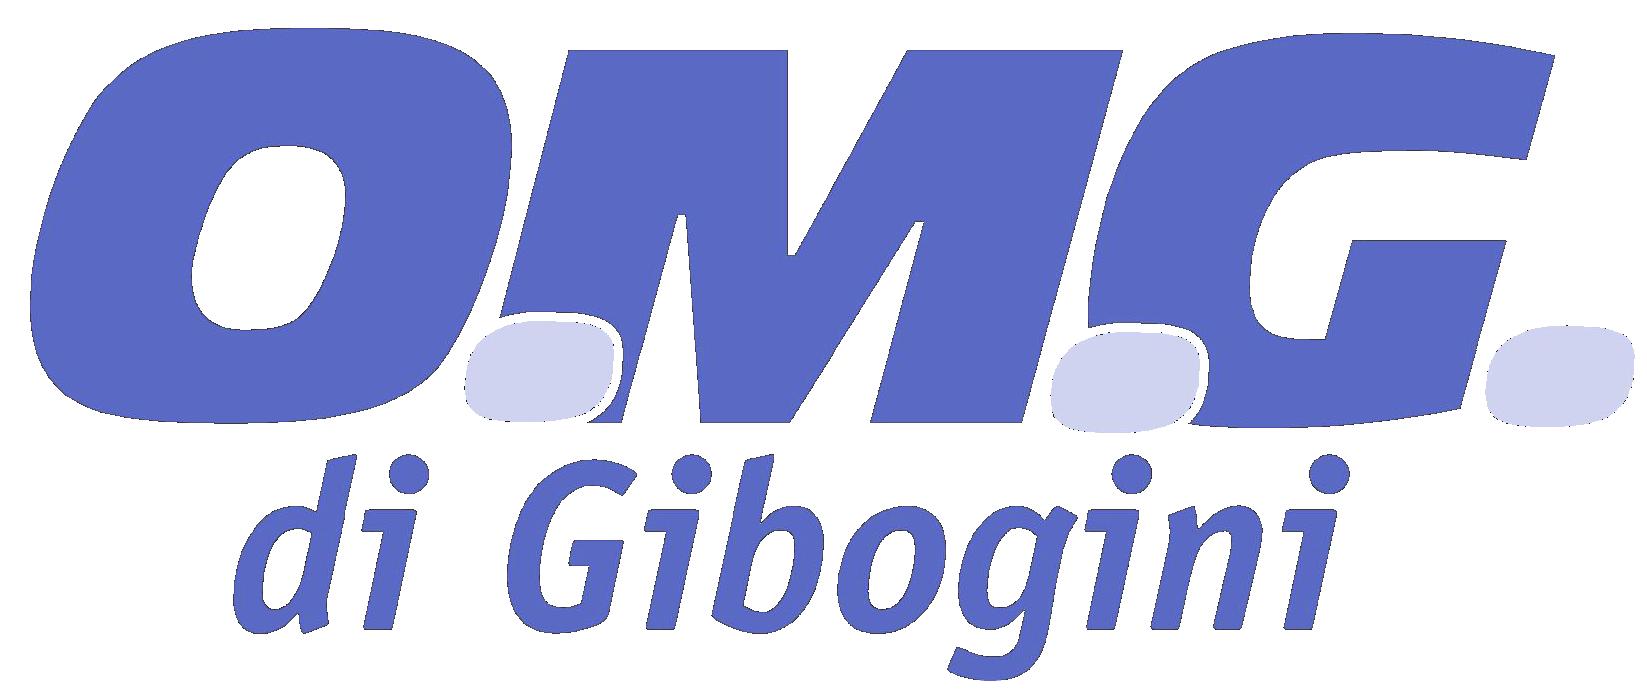 rona-dosificacion-logo-omg-header